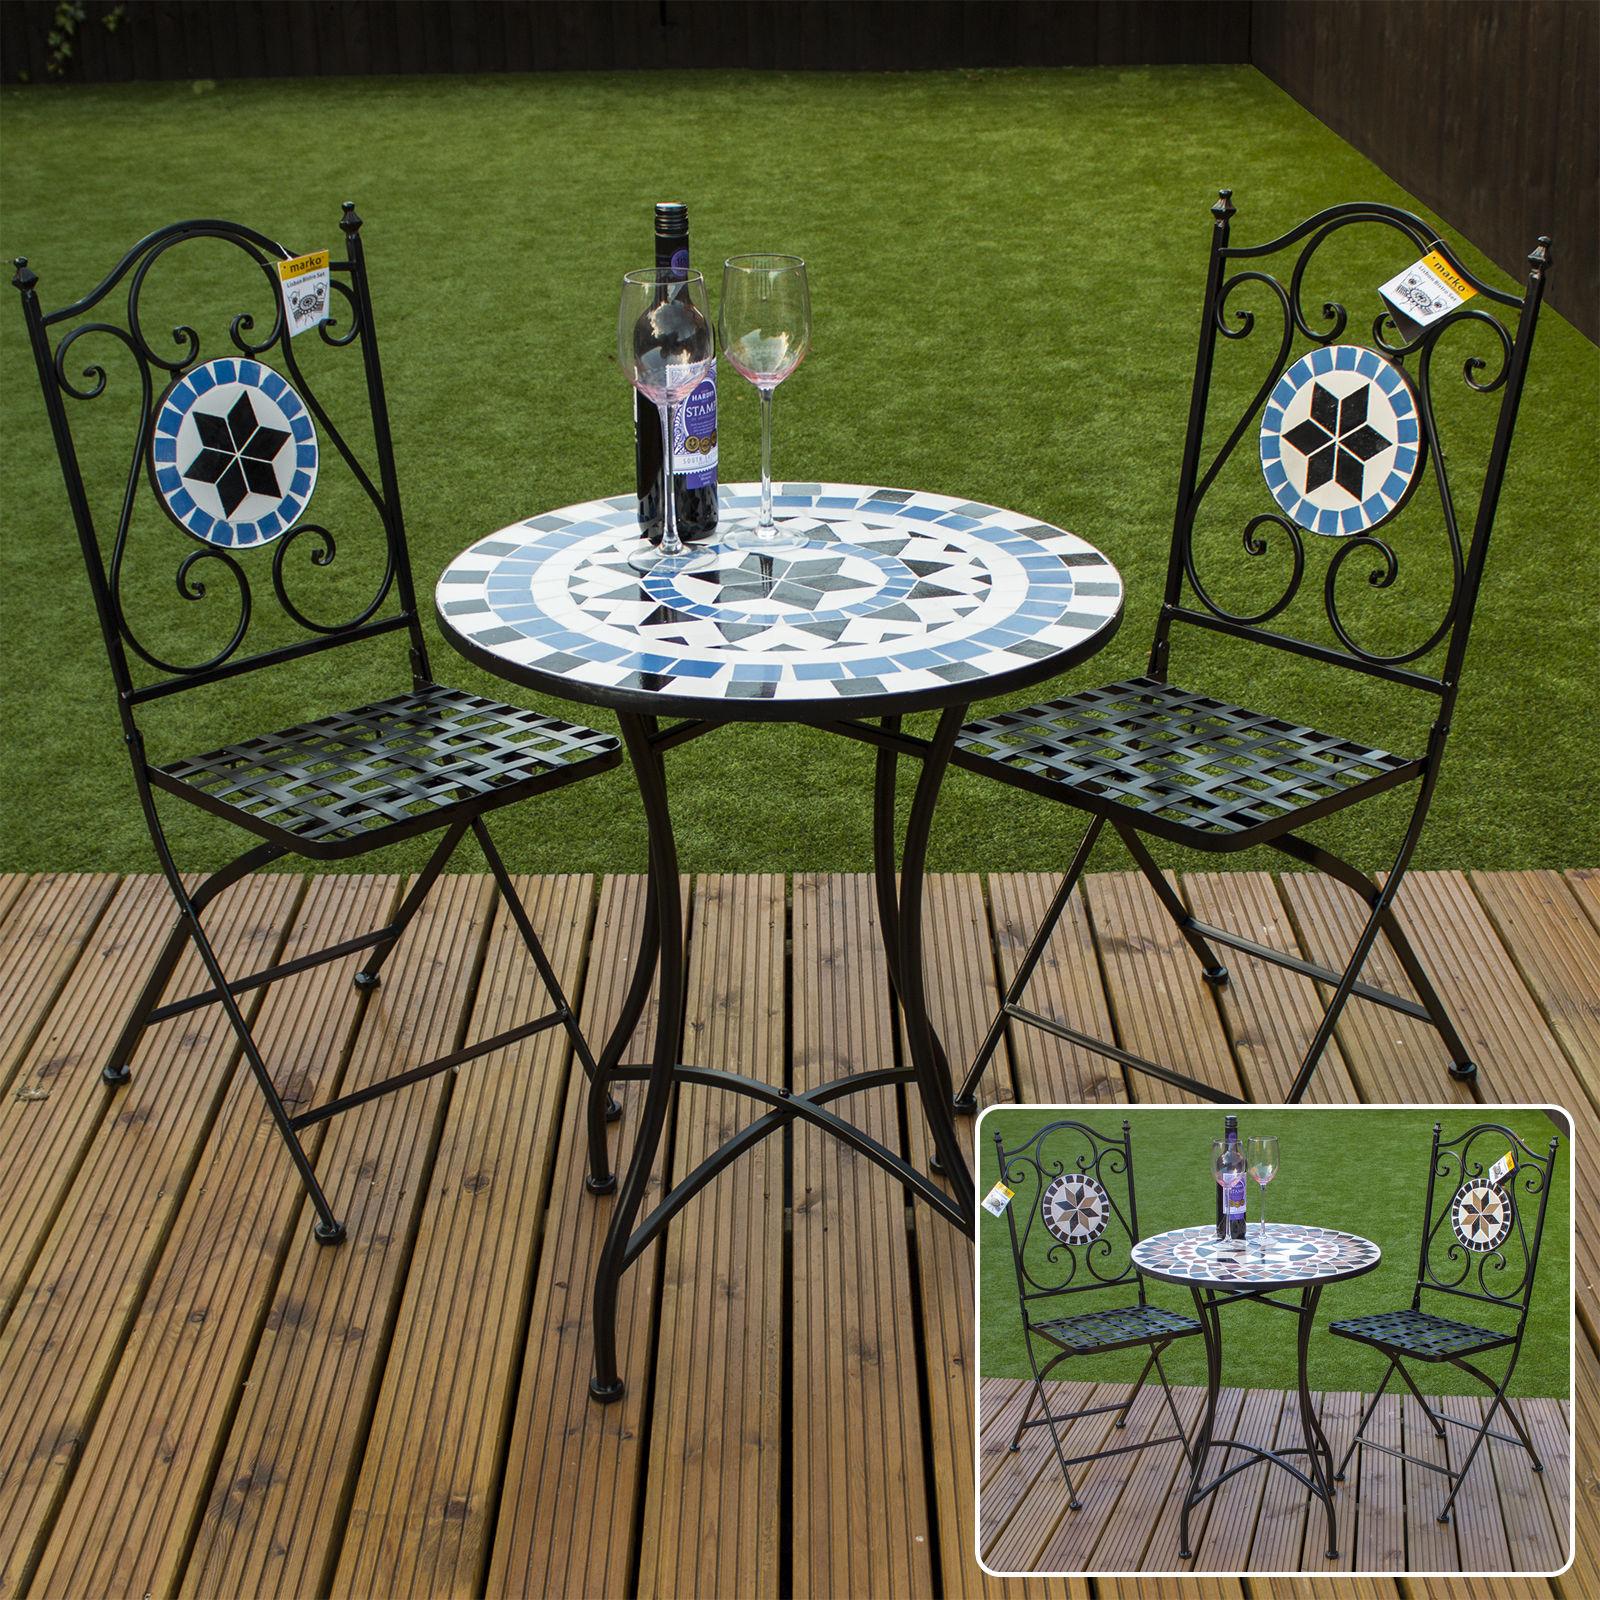 Marko Mosaic Bistro Set Outdoor Patio Garden Design Furniture Table And Chairs 5055493835948 Ebay Patio Garden Design Back Garden Design Outdoor Patio Decor